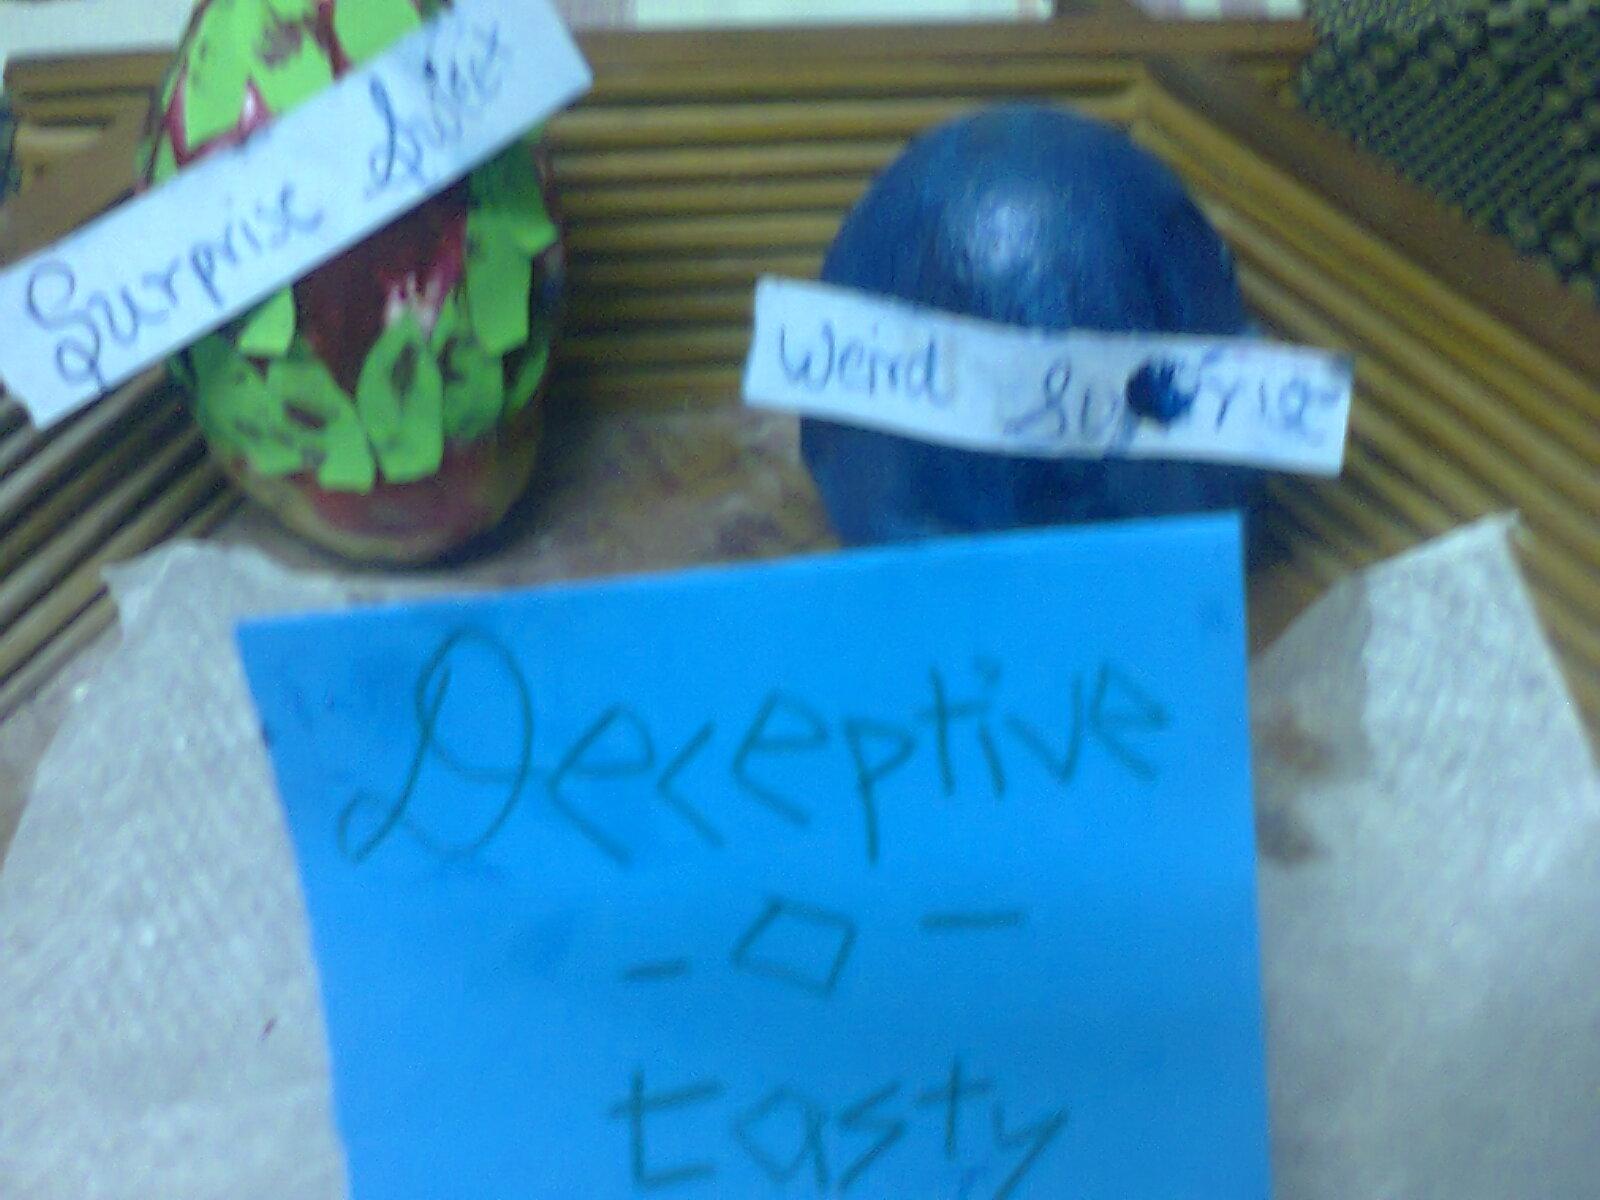 Picture of Deceptive - Licious Eggs